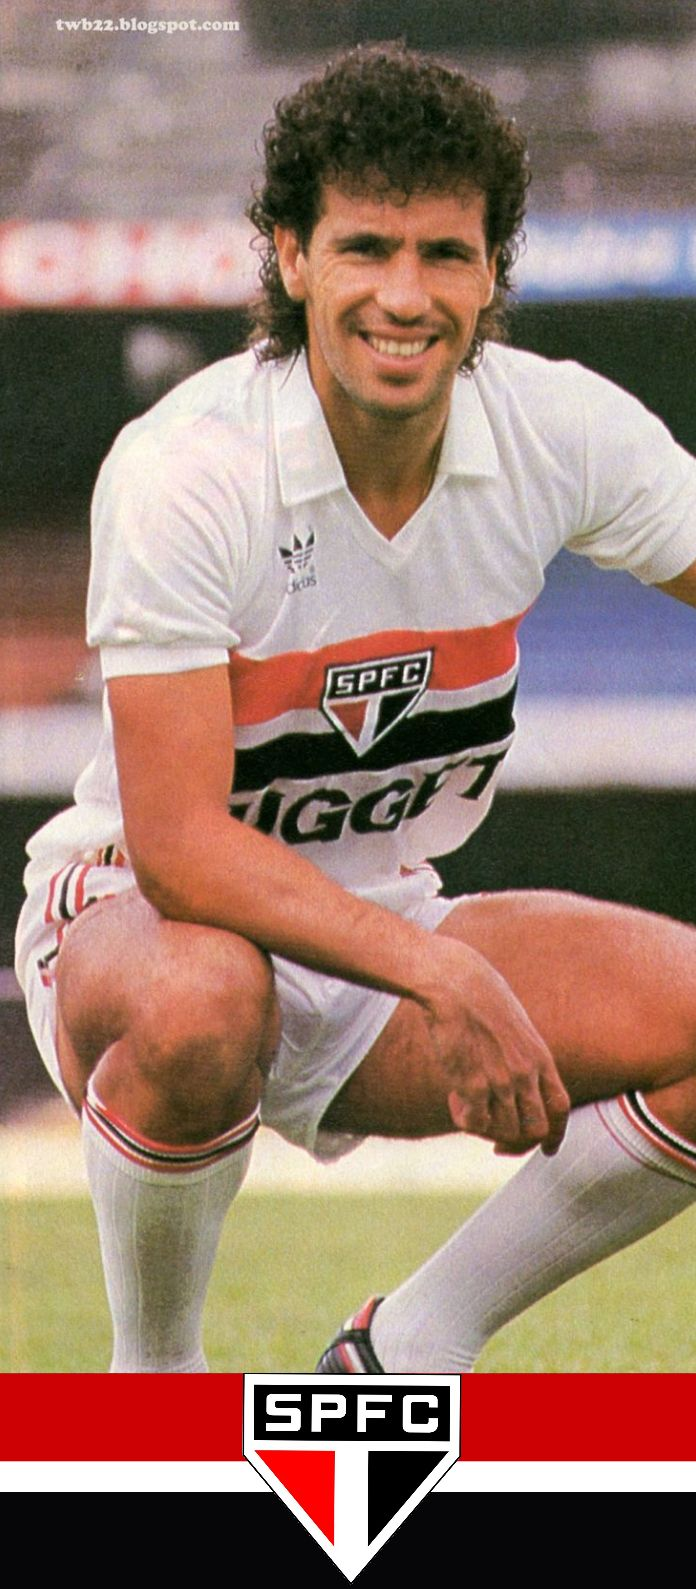 Careca, 1987, in the São Paulo FC